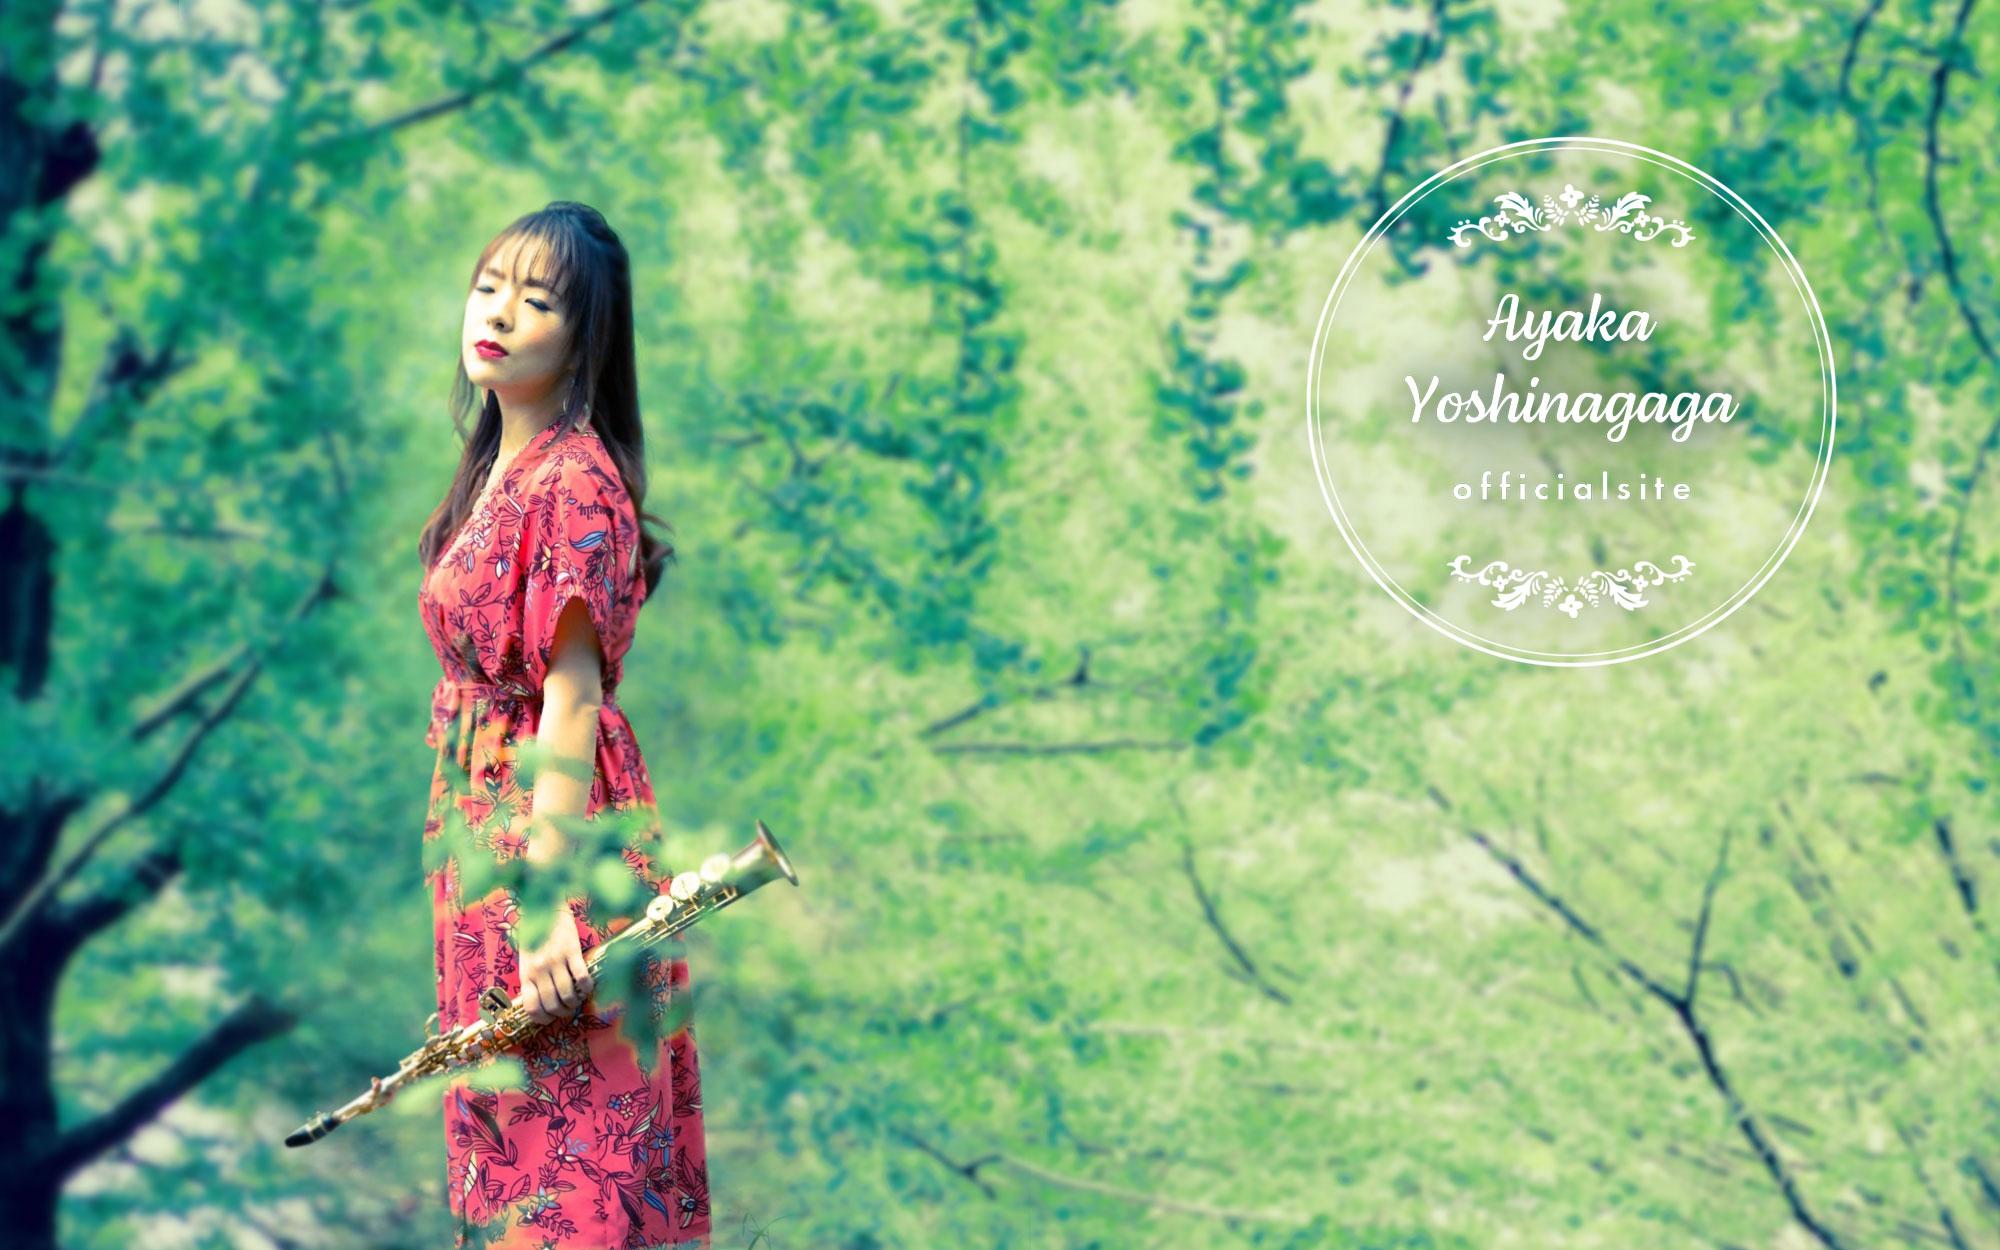 AYAKA YOSHINAGA-official website